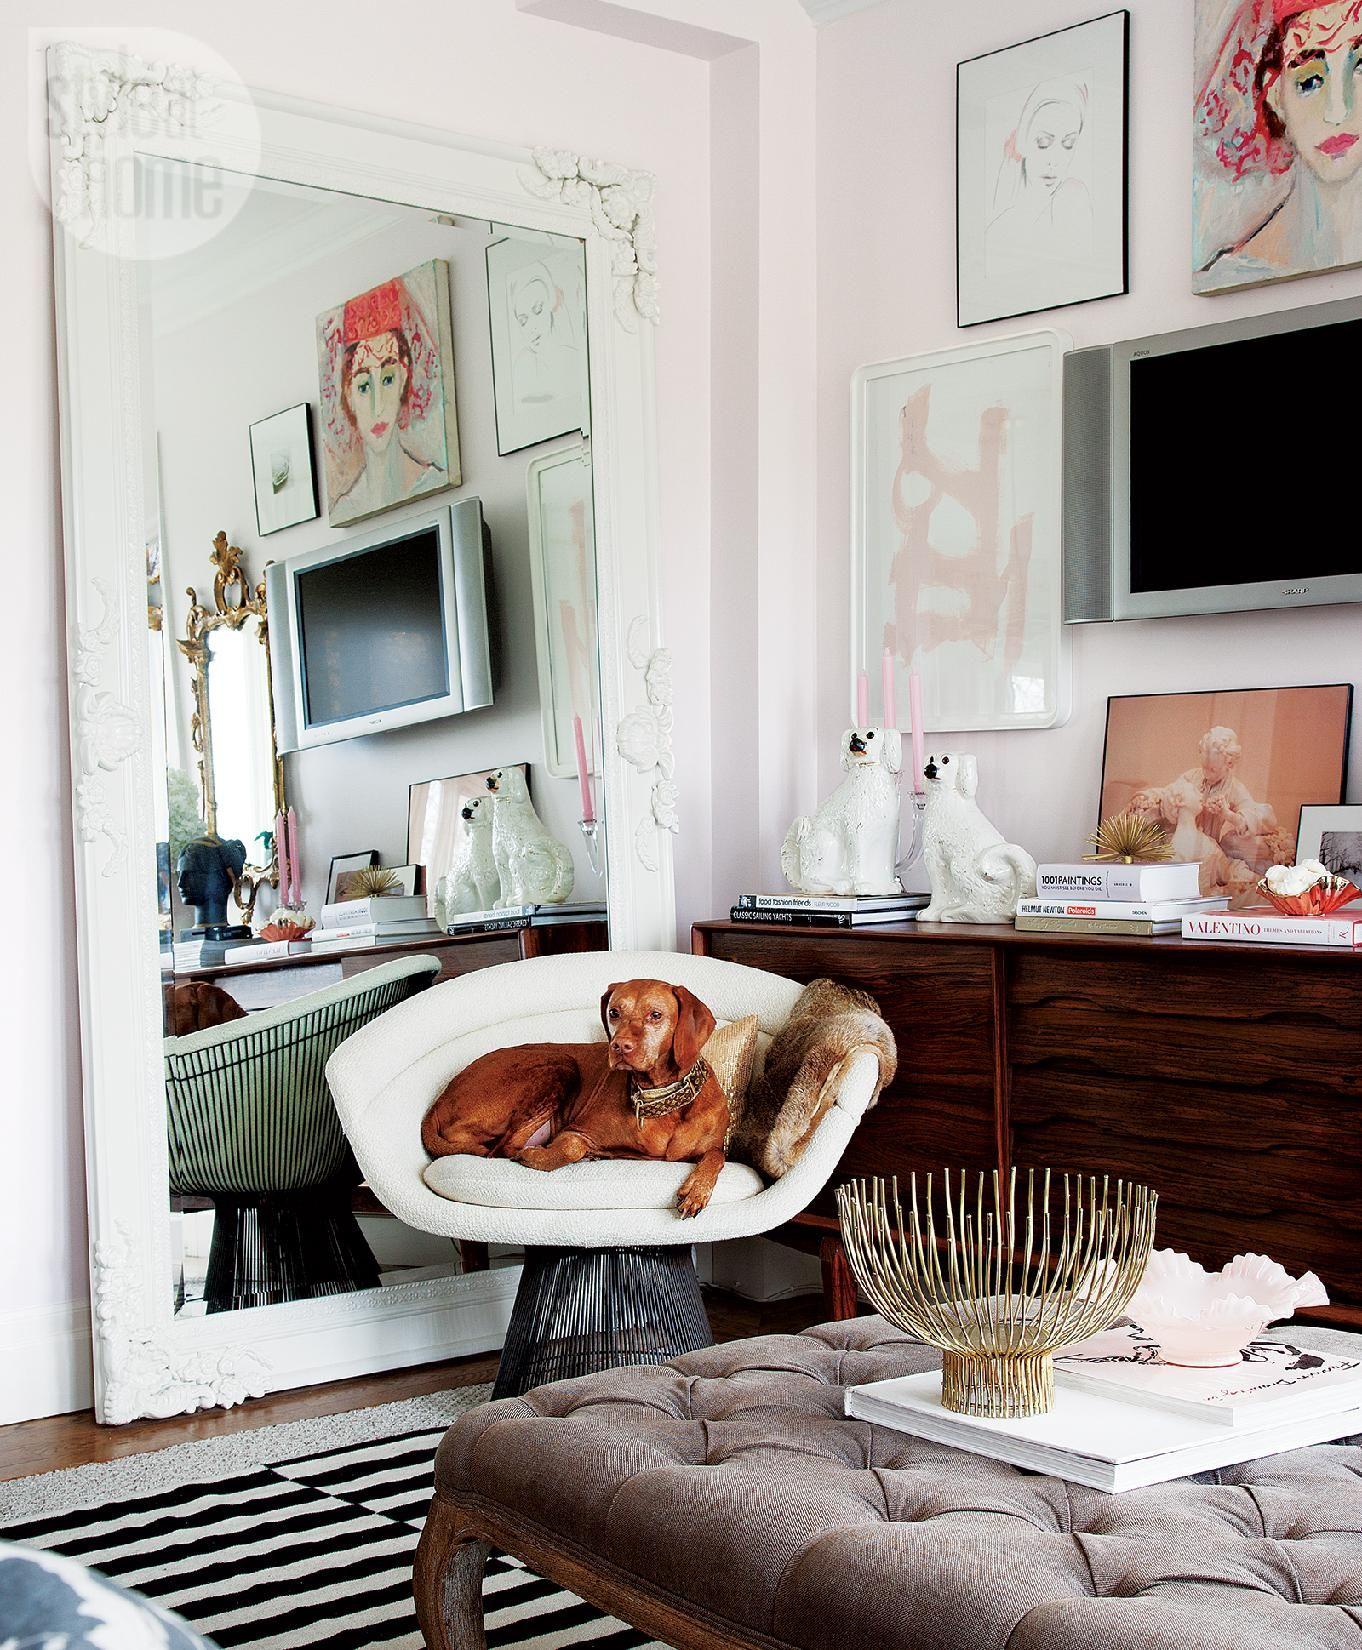 Pin de marianichi en Doggies make house a home Pinterest